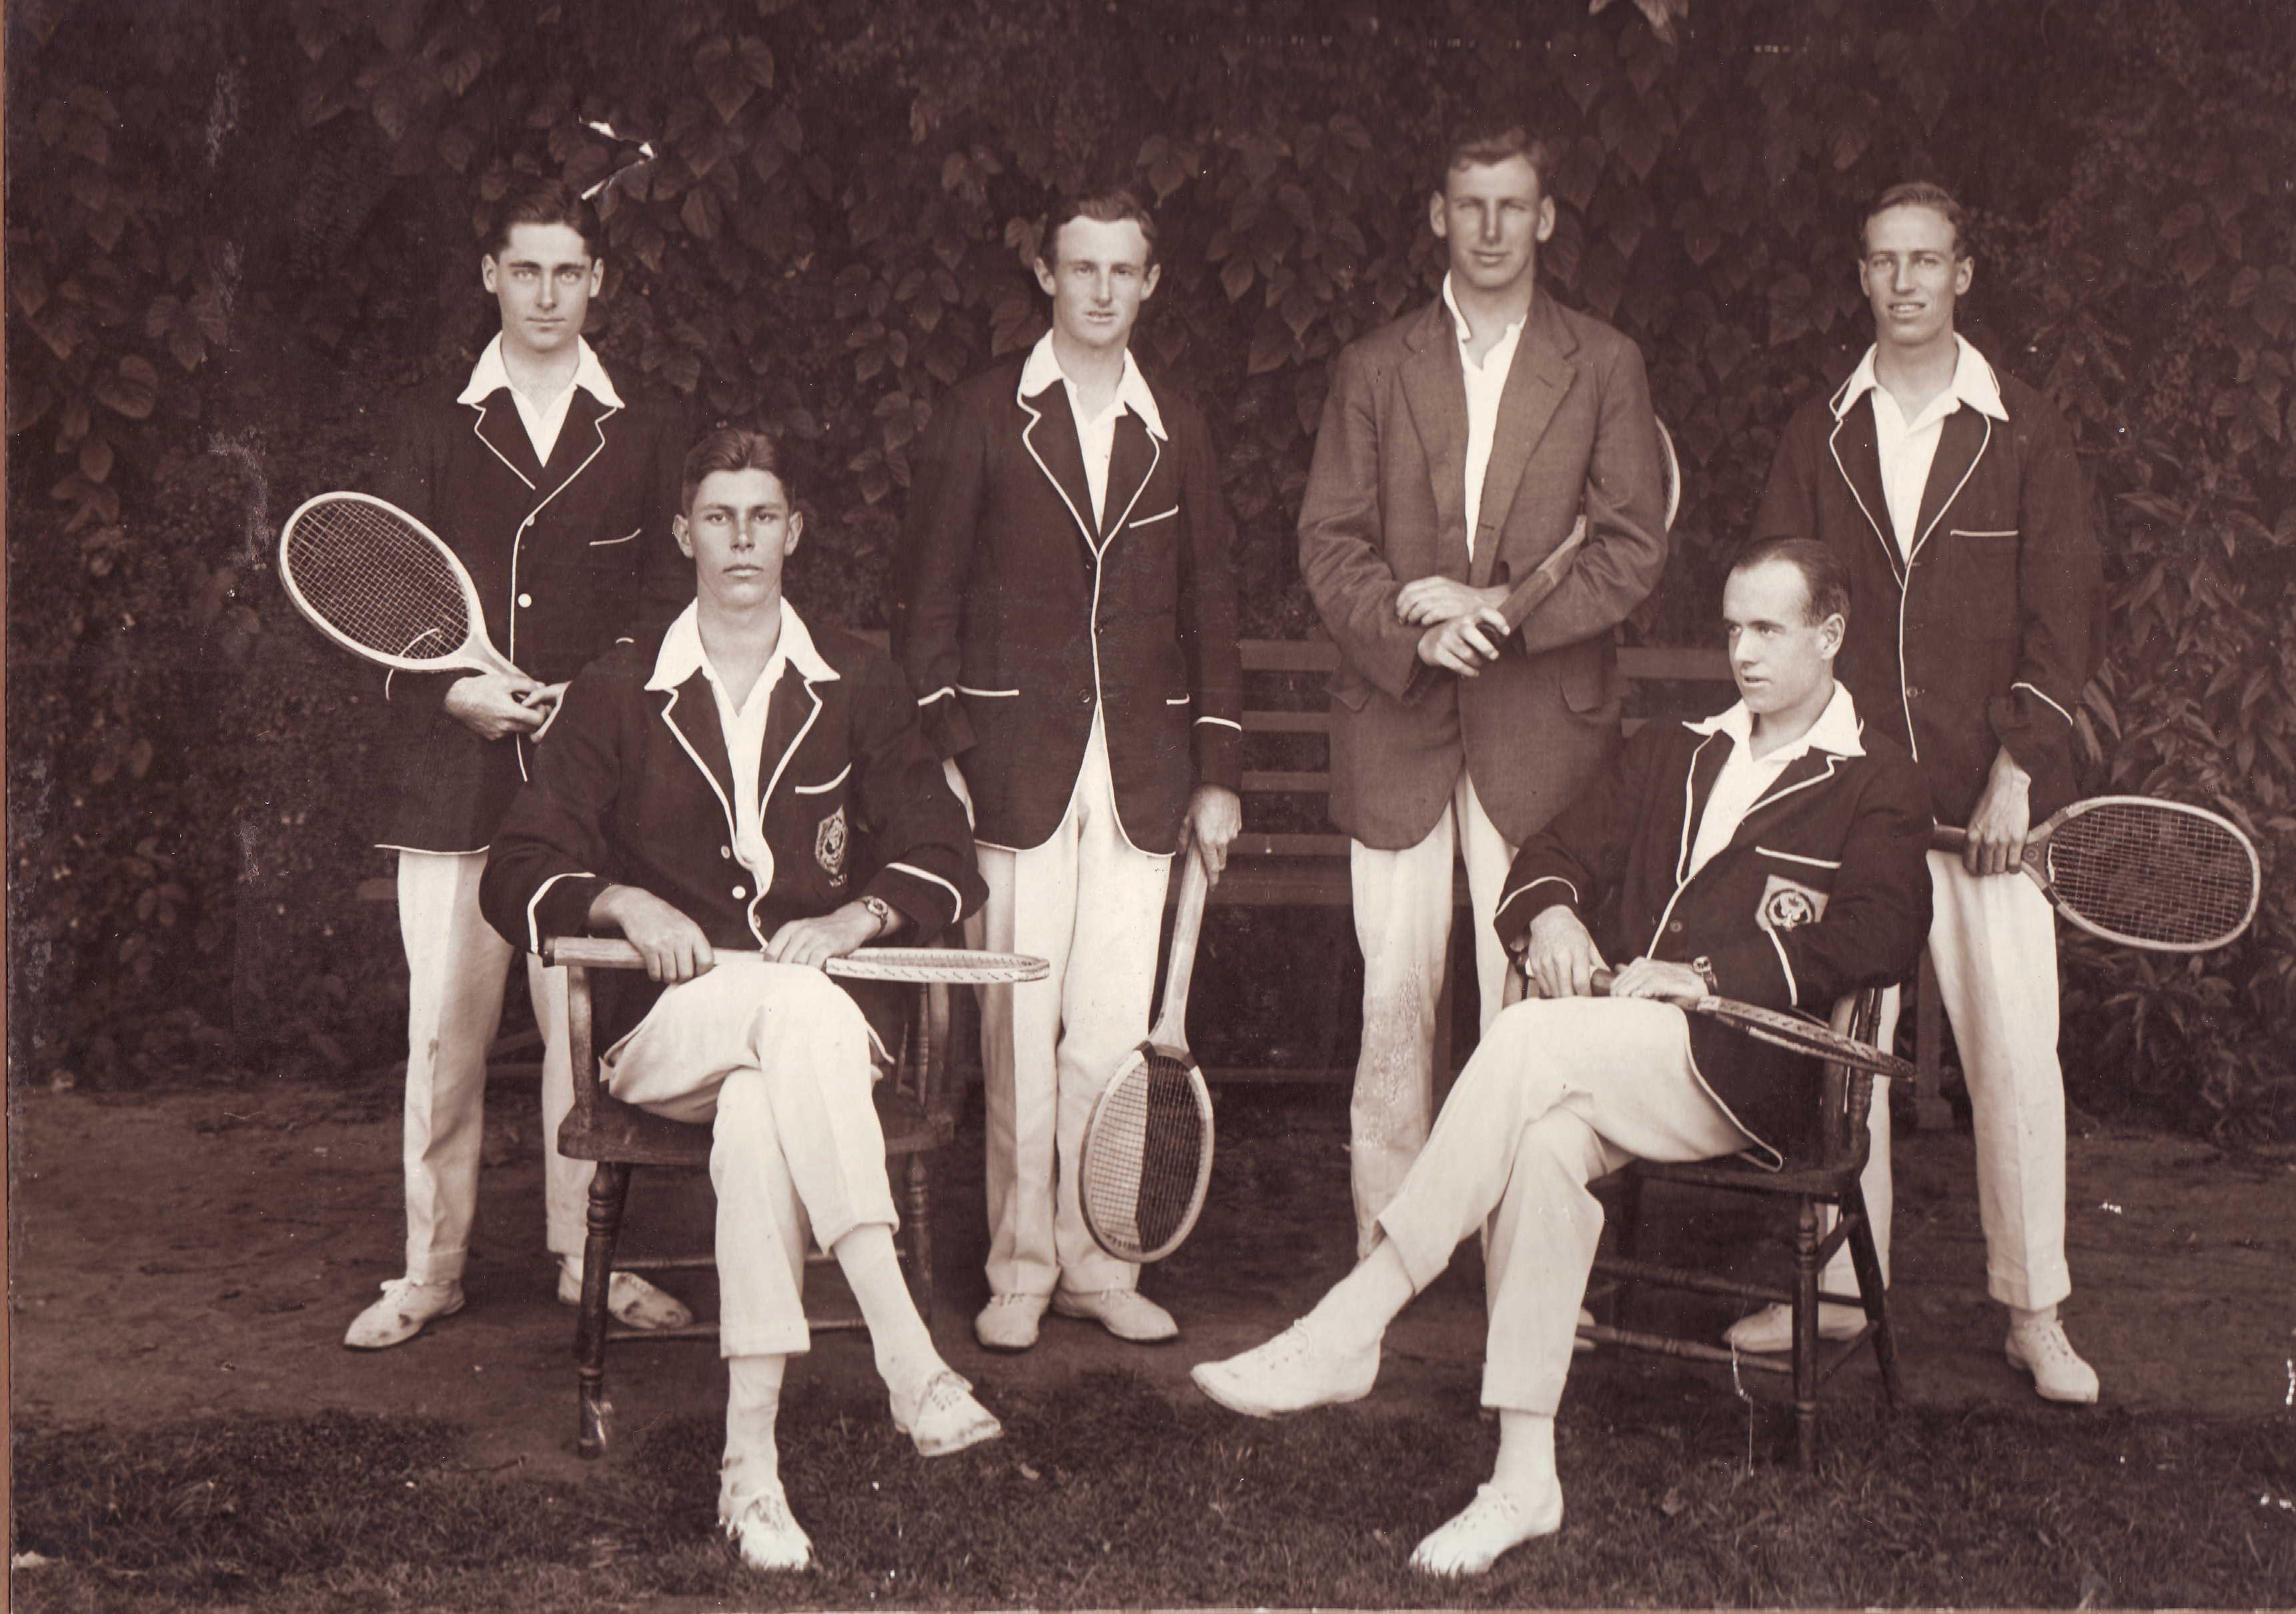 11510220.jpg 3,442×2,419 pixels Tennis clothes, Vintage